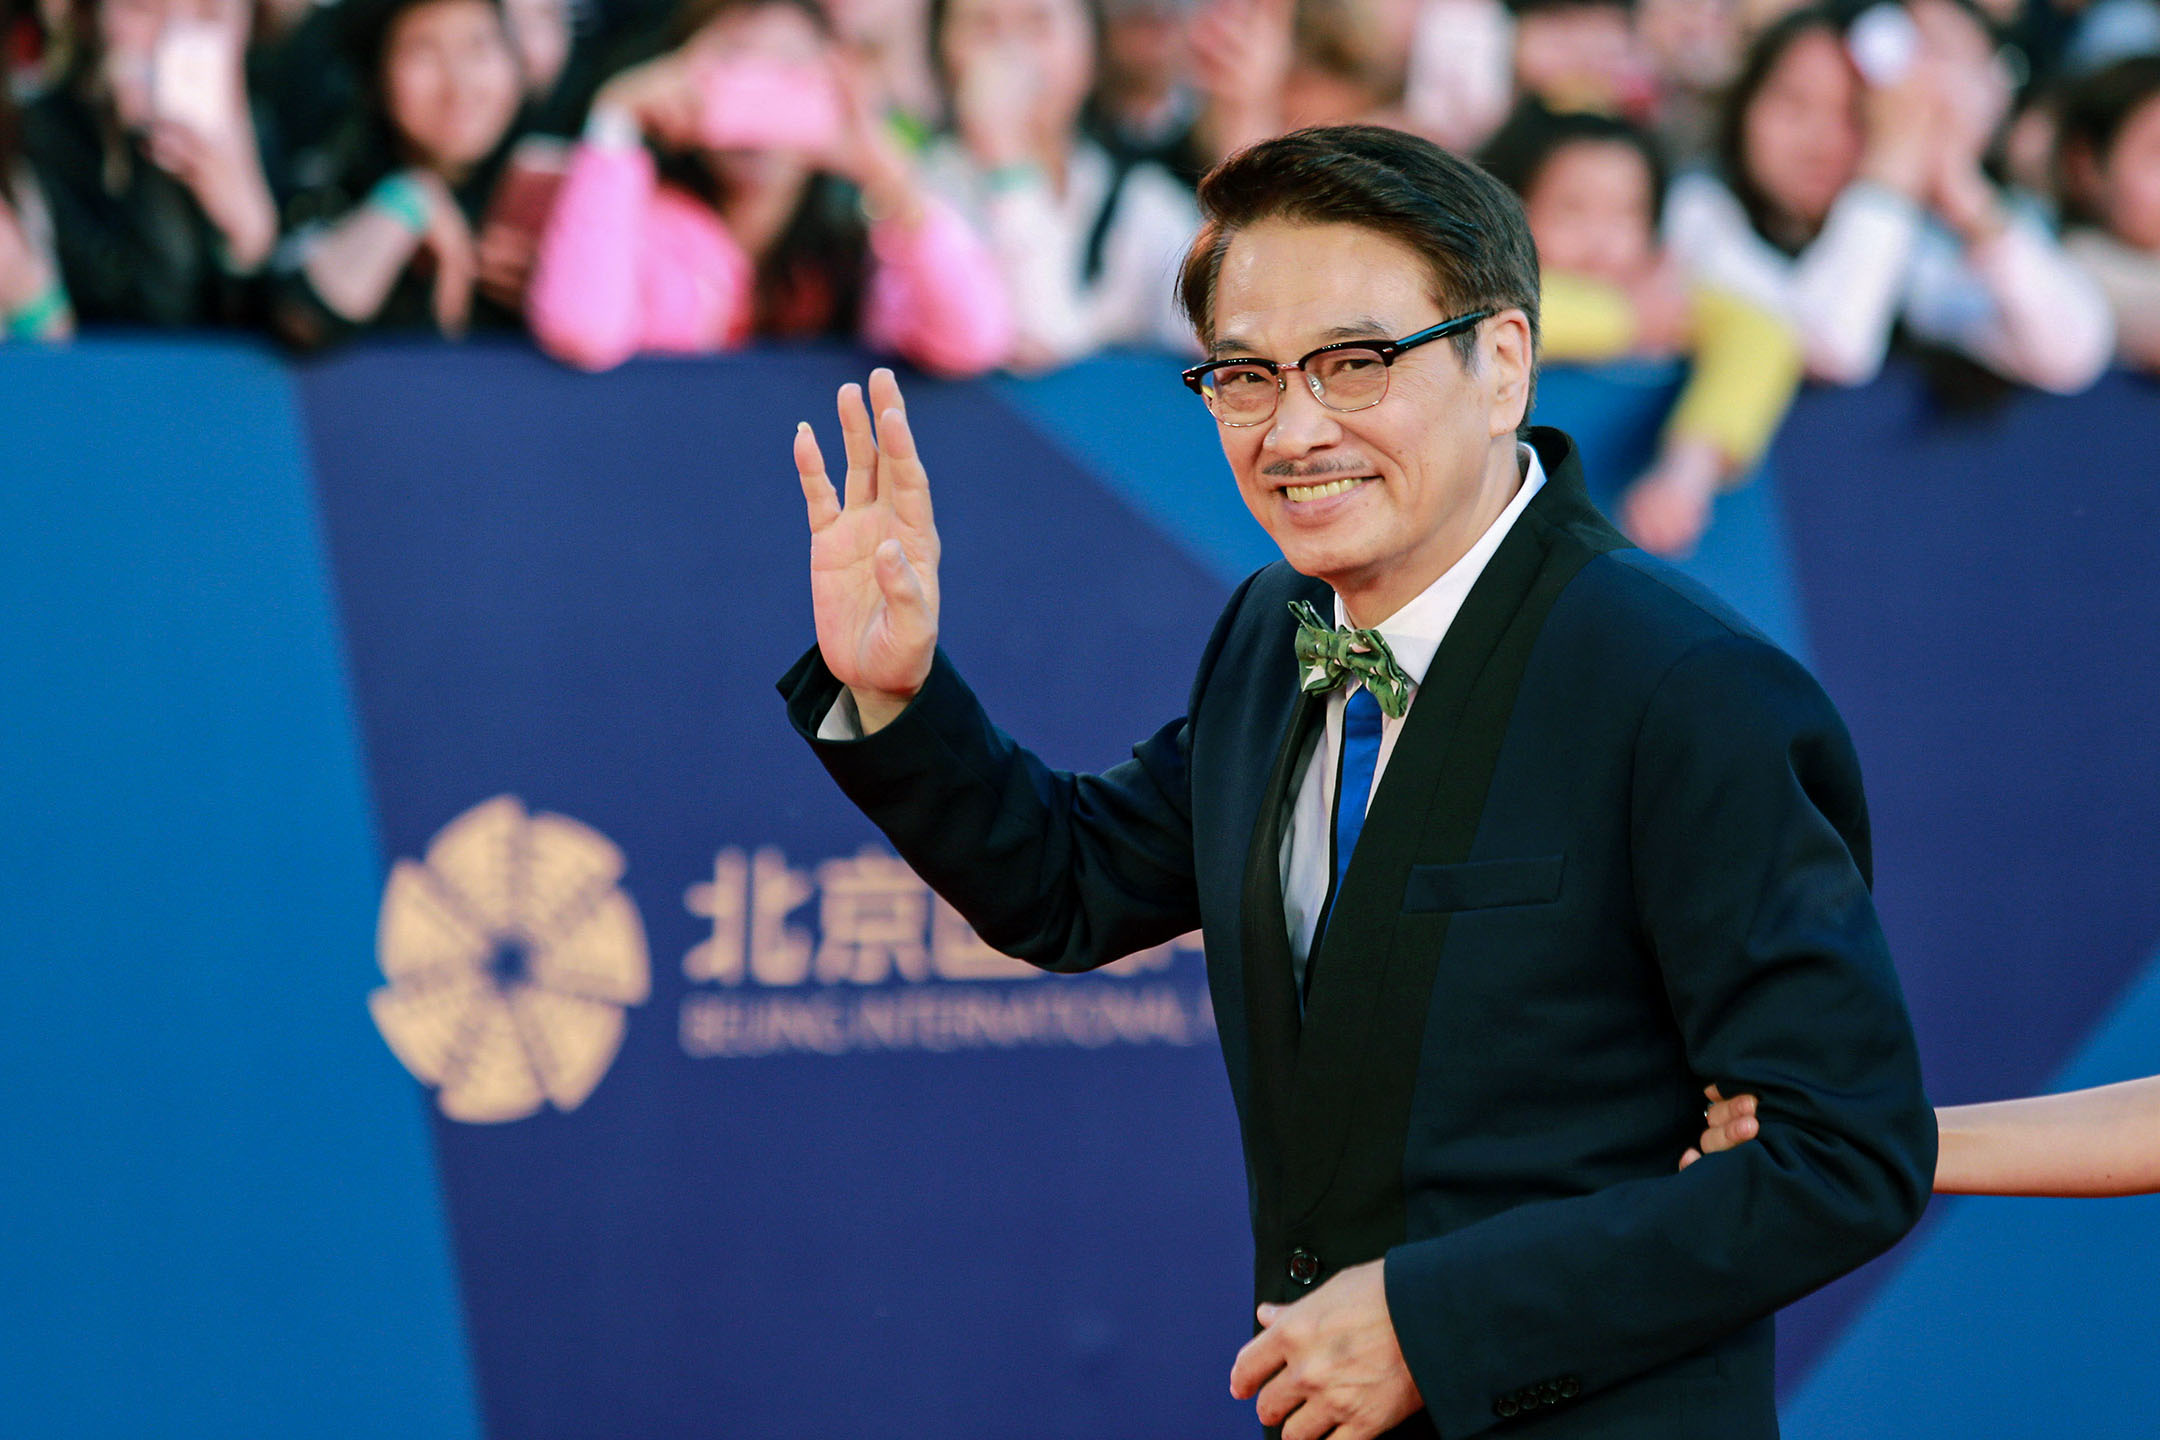 2015年4月16日北京,演員吳孟達在第五屆北京國際電影節。 攝:Visual China Group via Getty Images